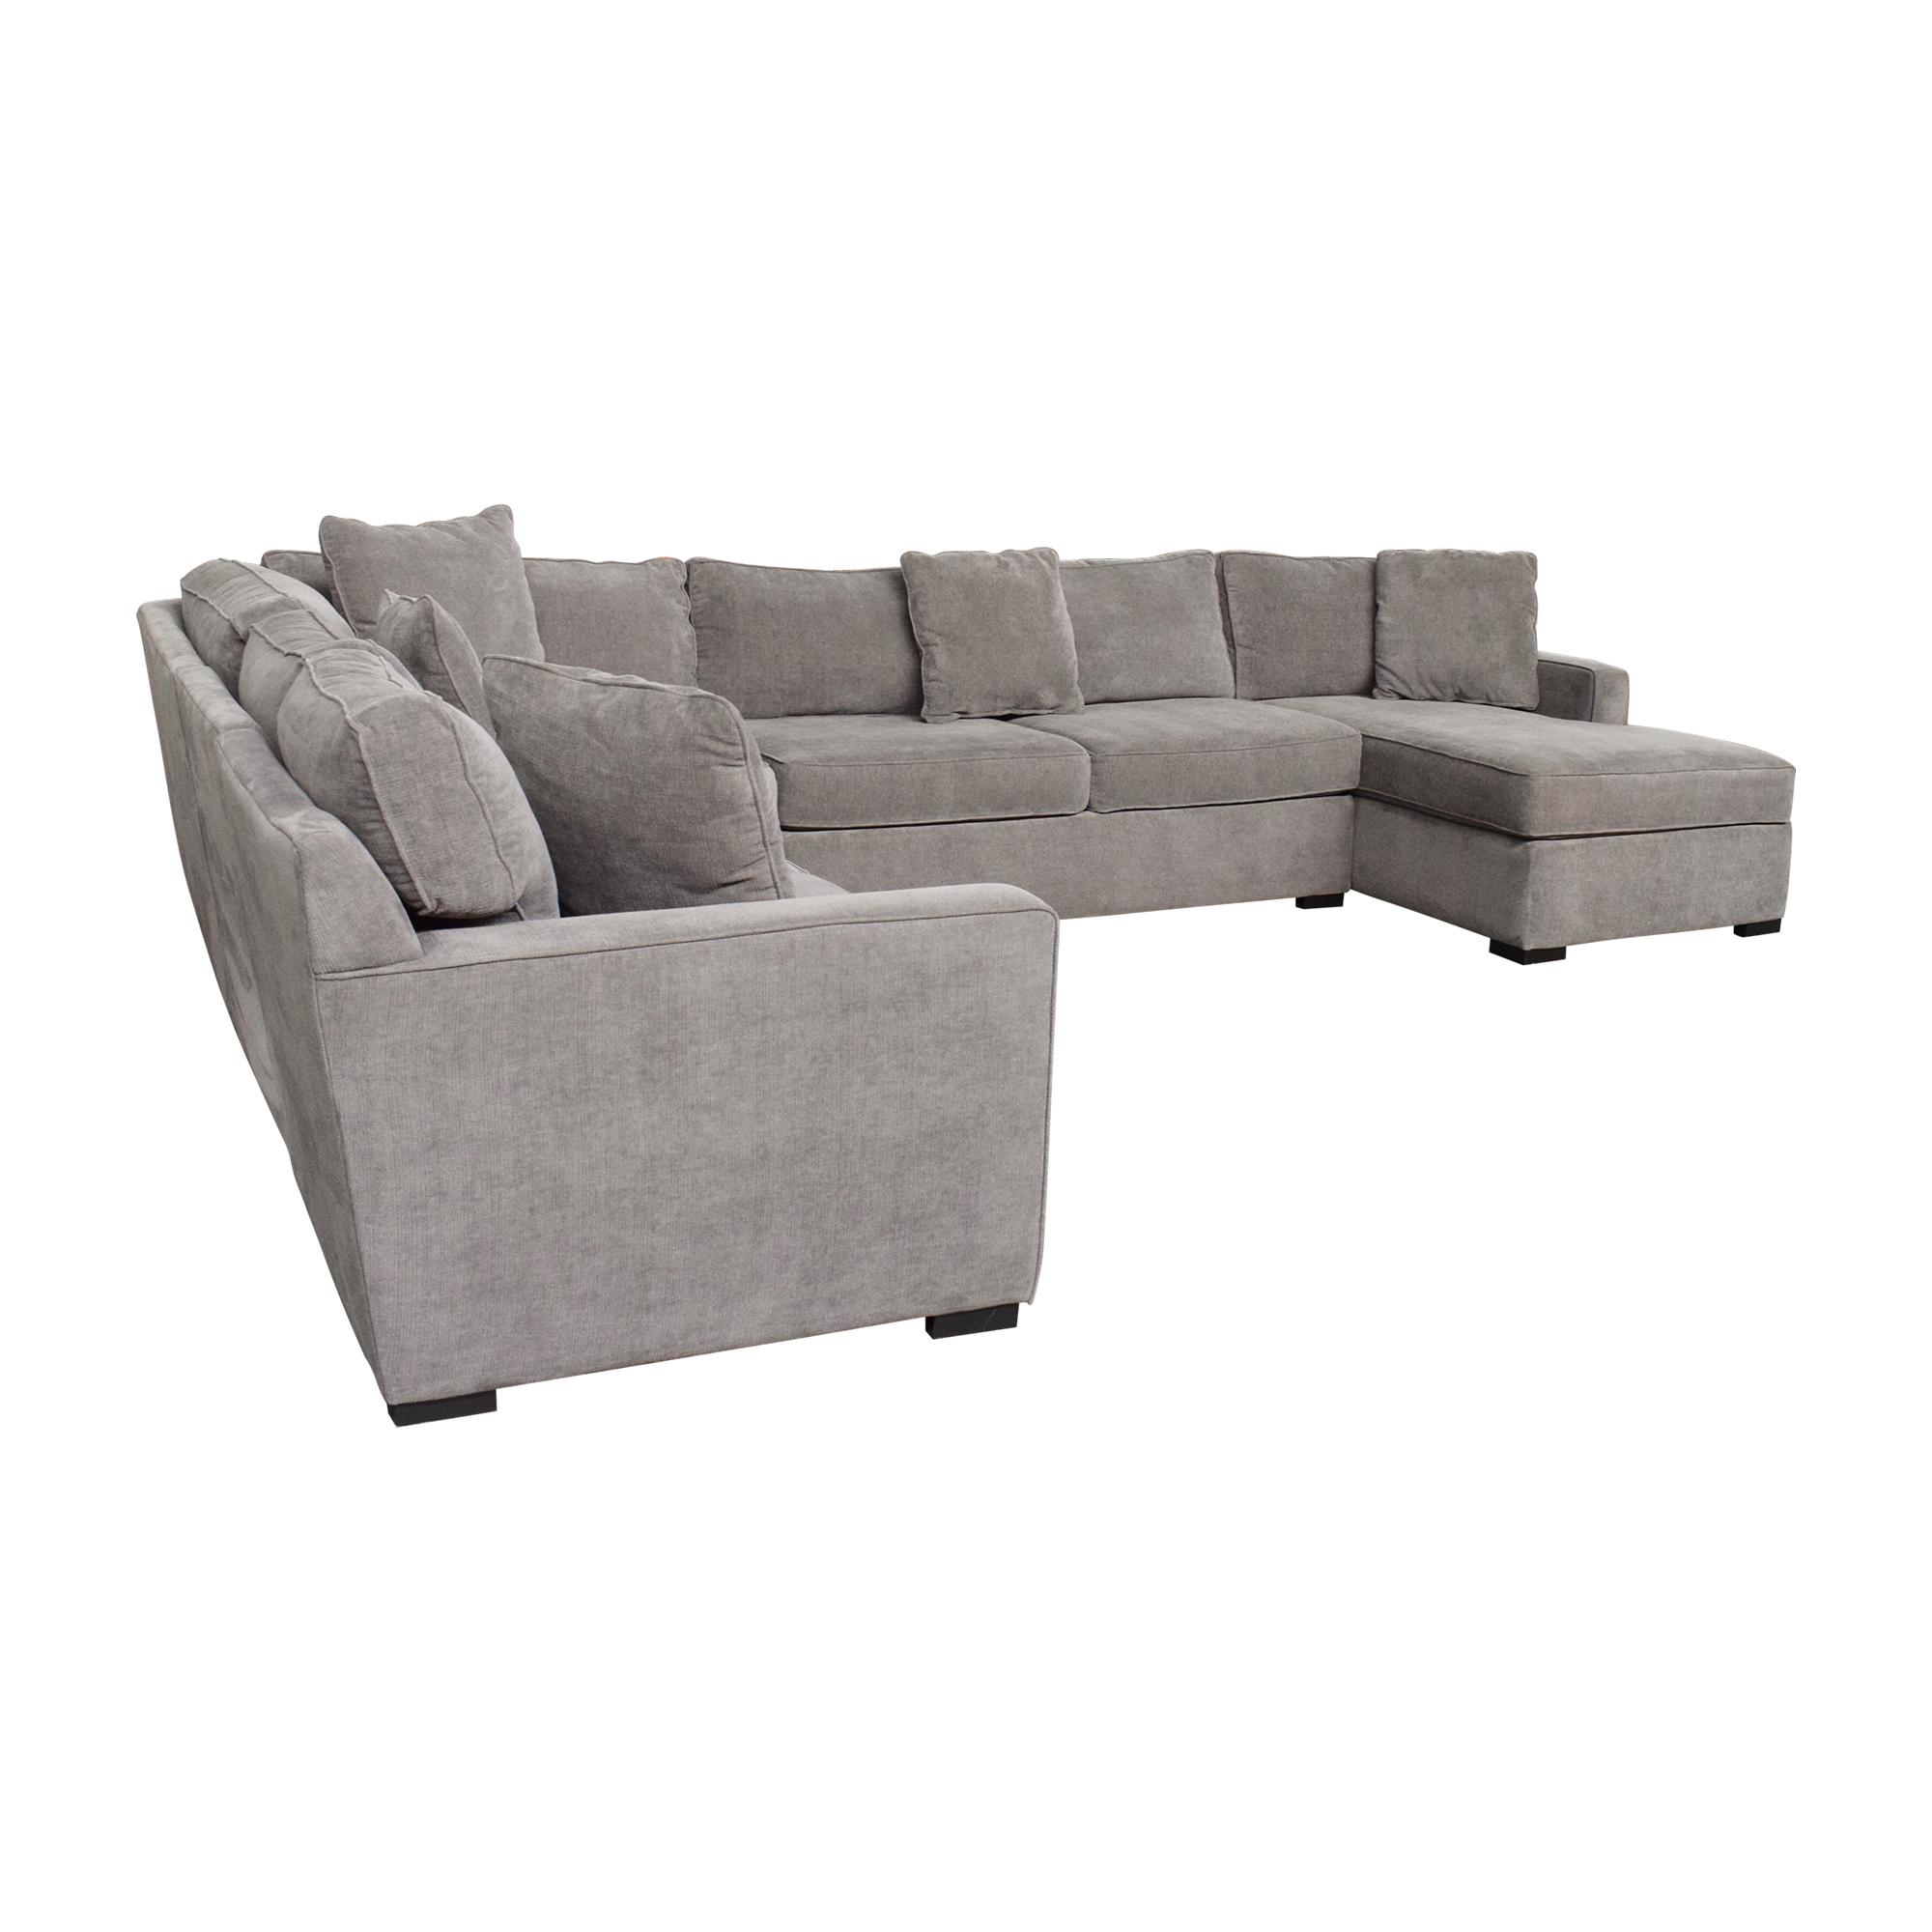 Macy's Macy's U-Shaped Chaise Sectional Sofa on sale